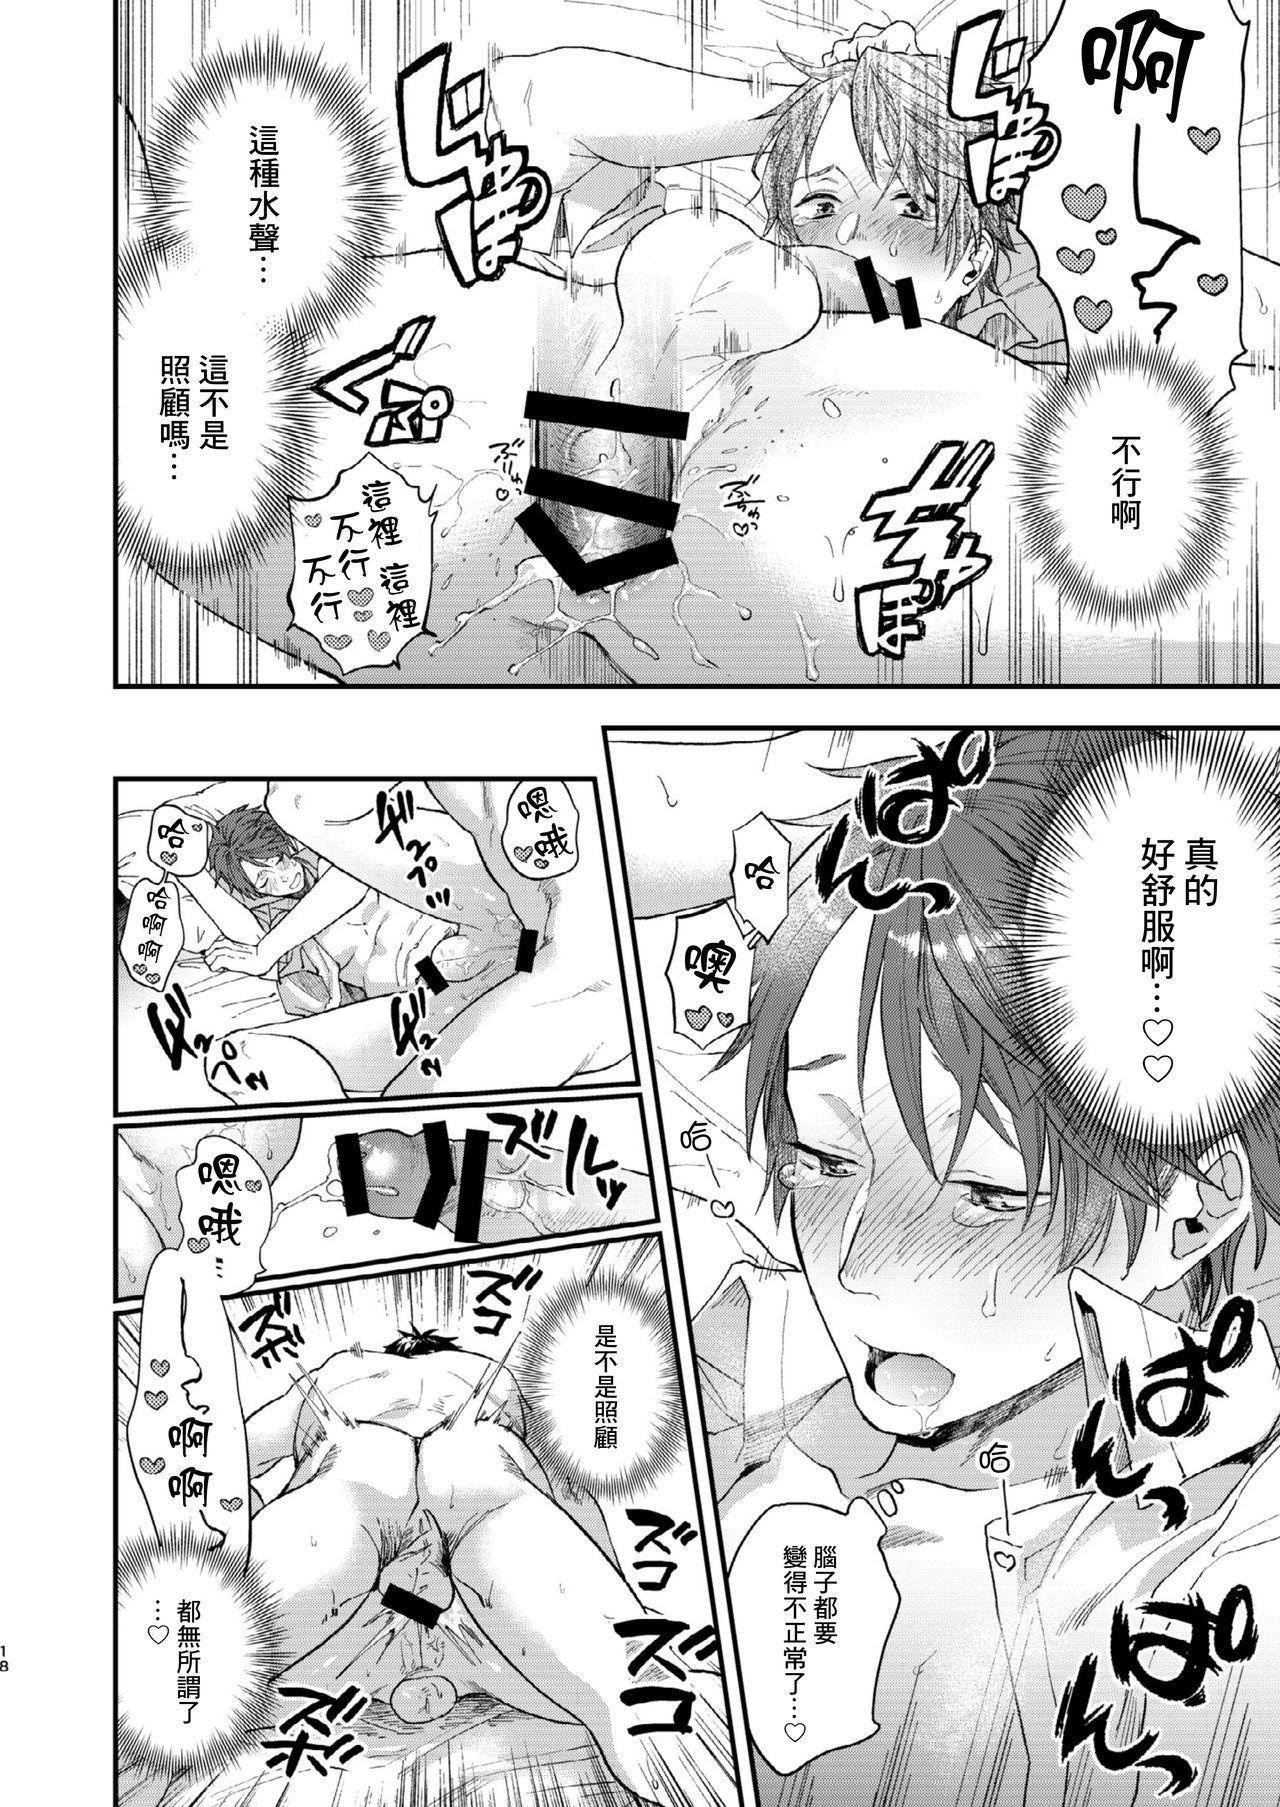 Tonde Hiniiru Yarimokonke   跳入火坑的约炮直男 15